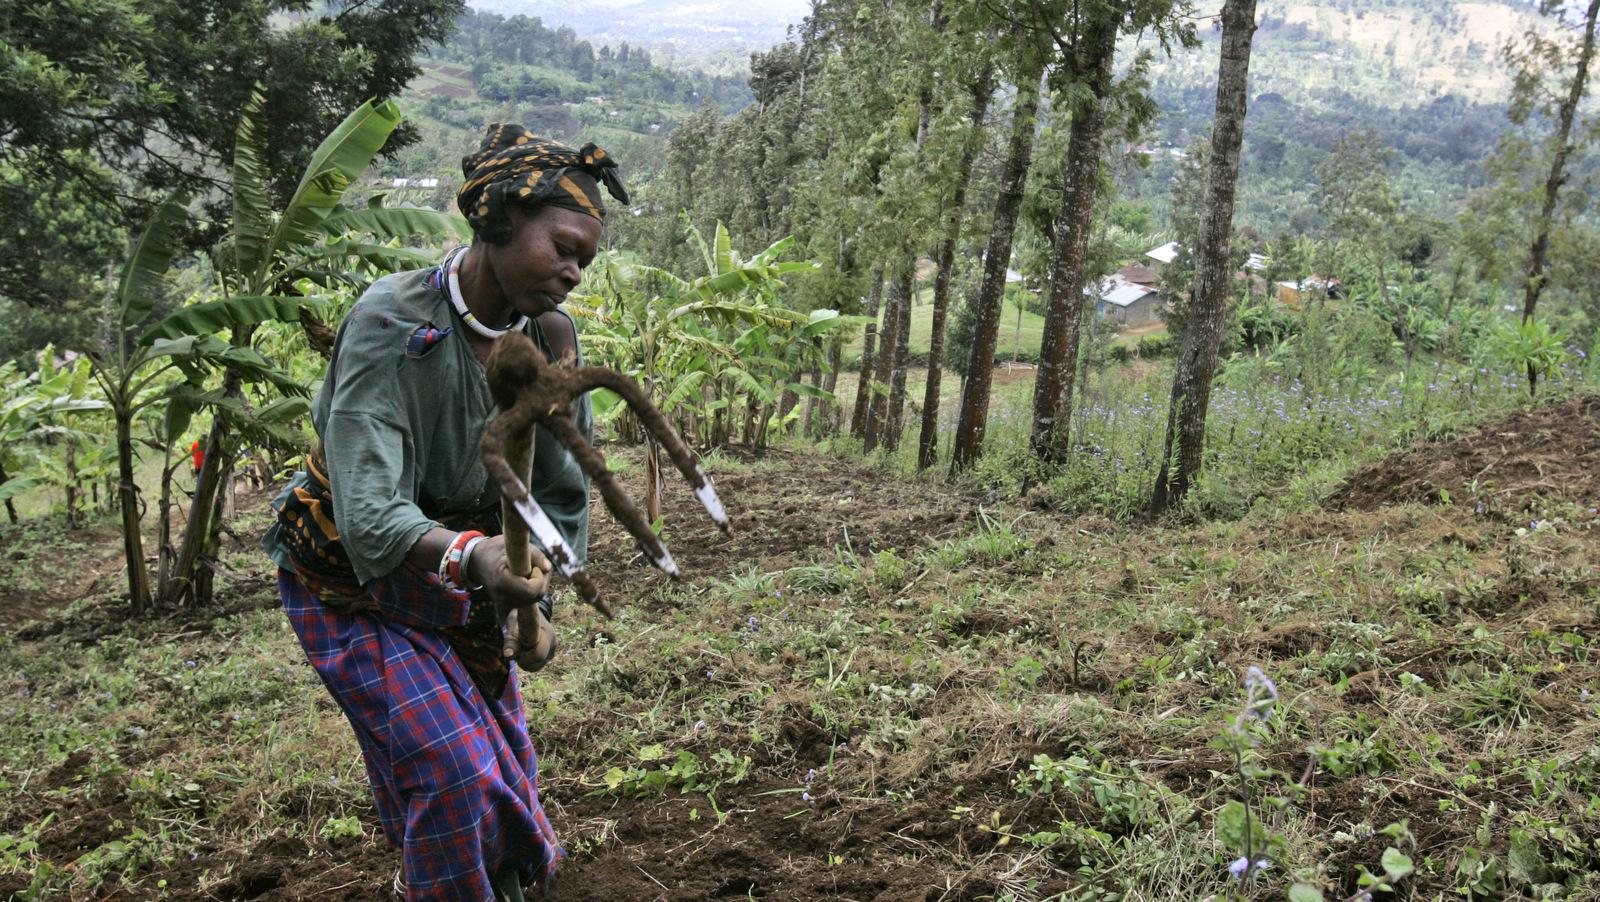 A woman works a field near the Tanzanian town of Arusha. (AP/Karel Prinsloo)